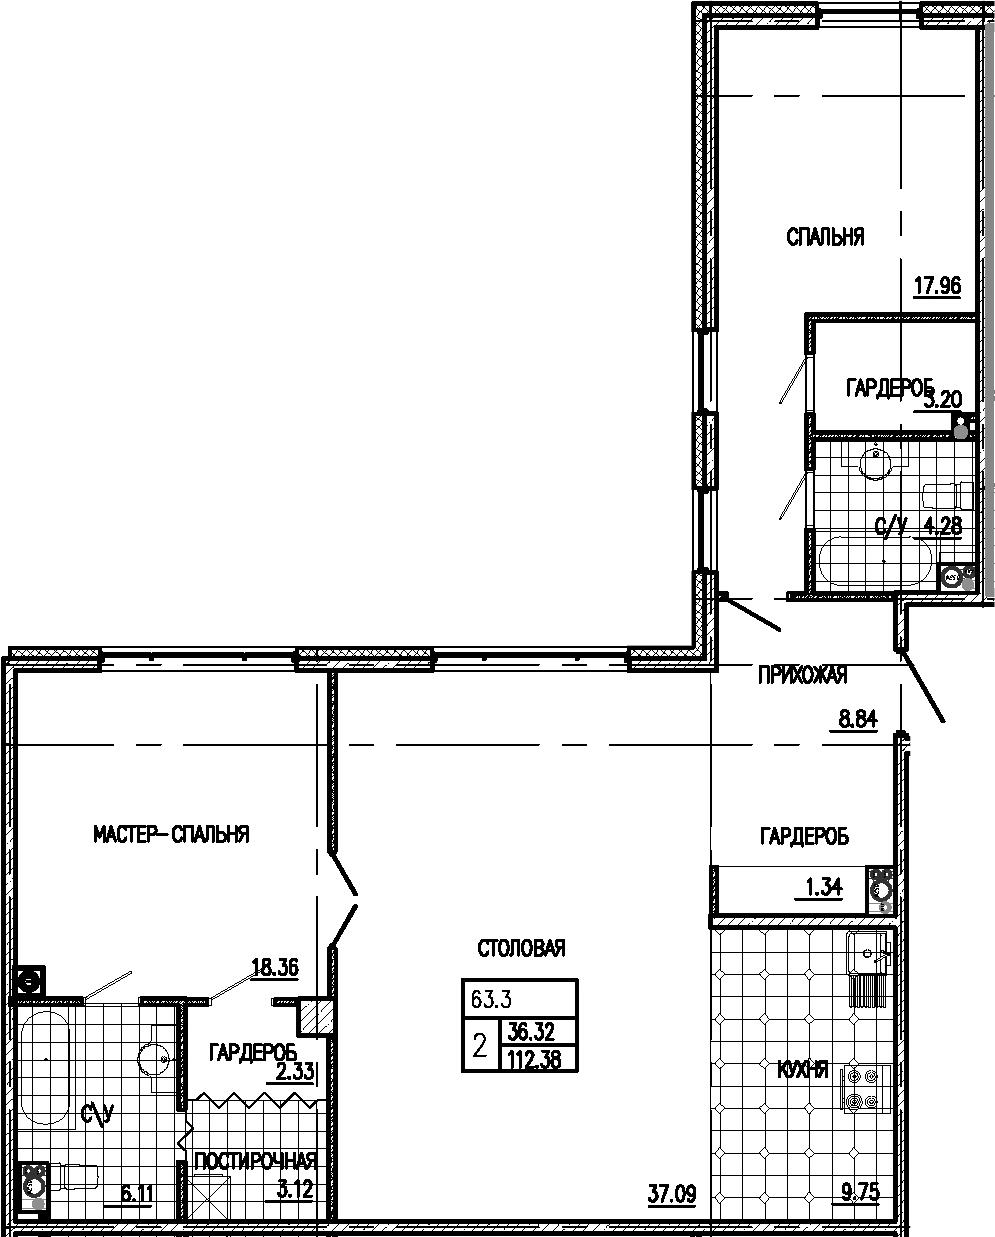 3Е-к.кв, 112.38 м²